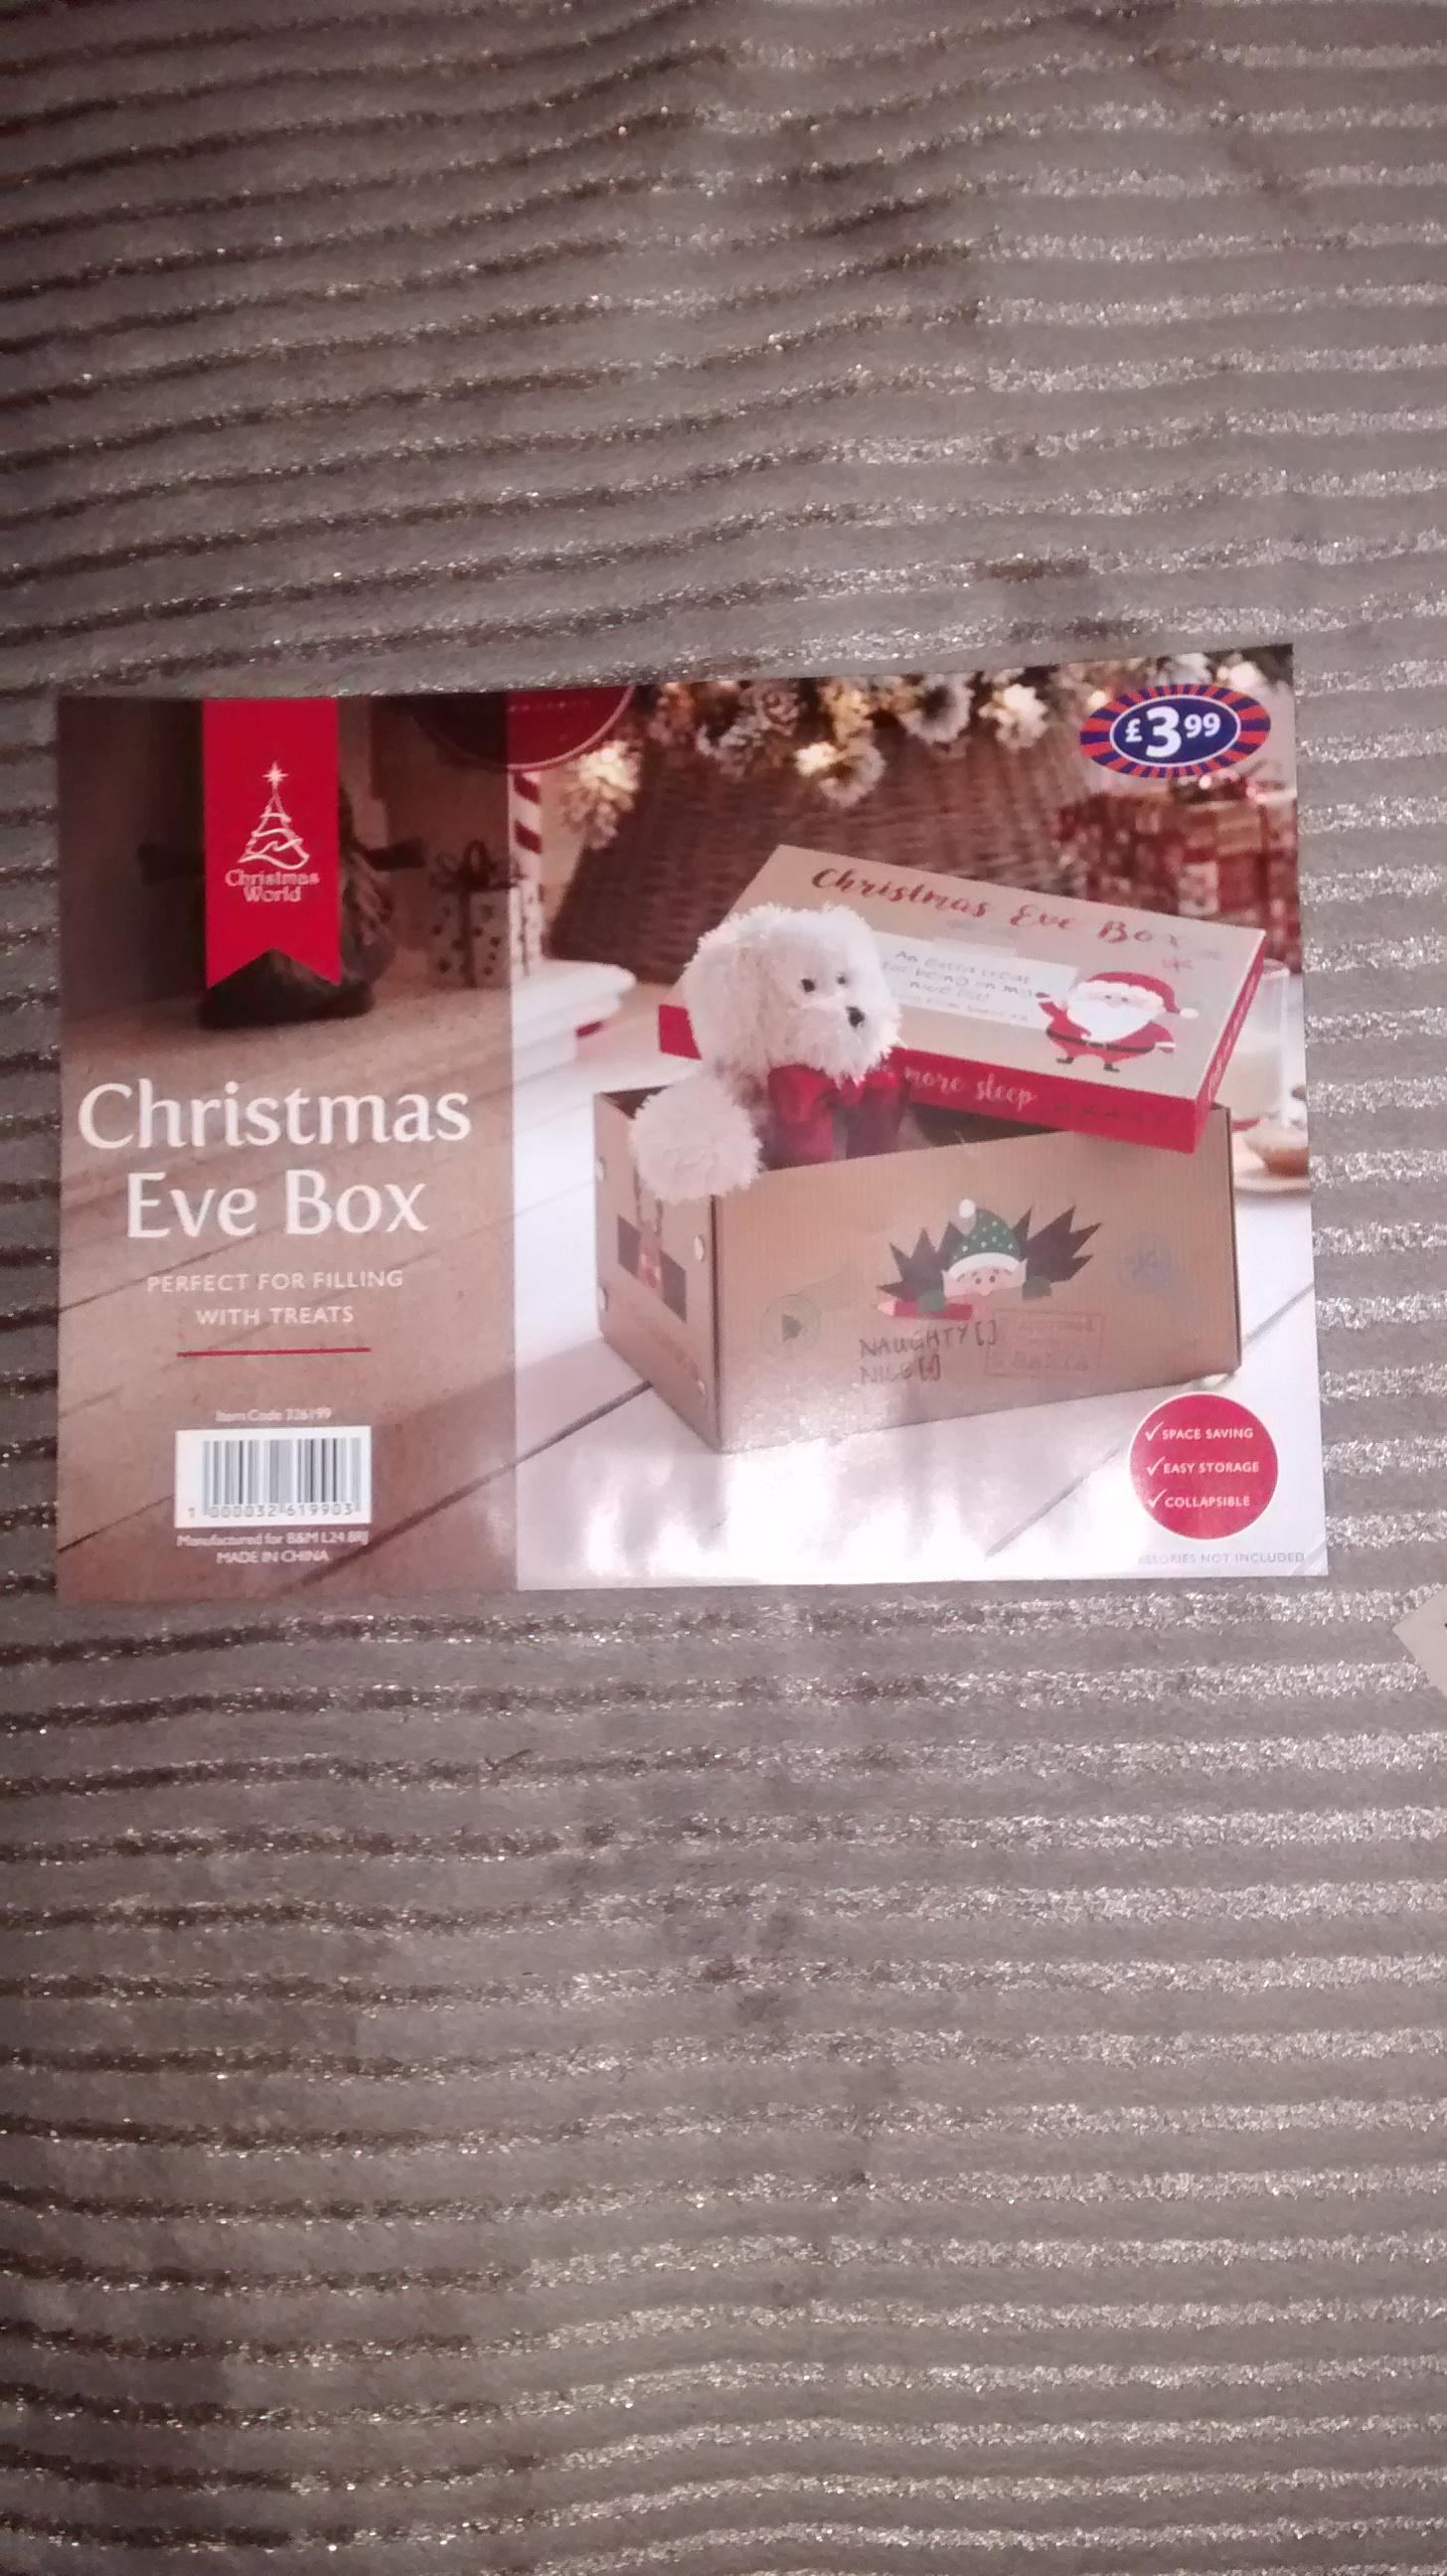 Xmas Eve box £3.99 instore @ B&M